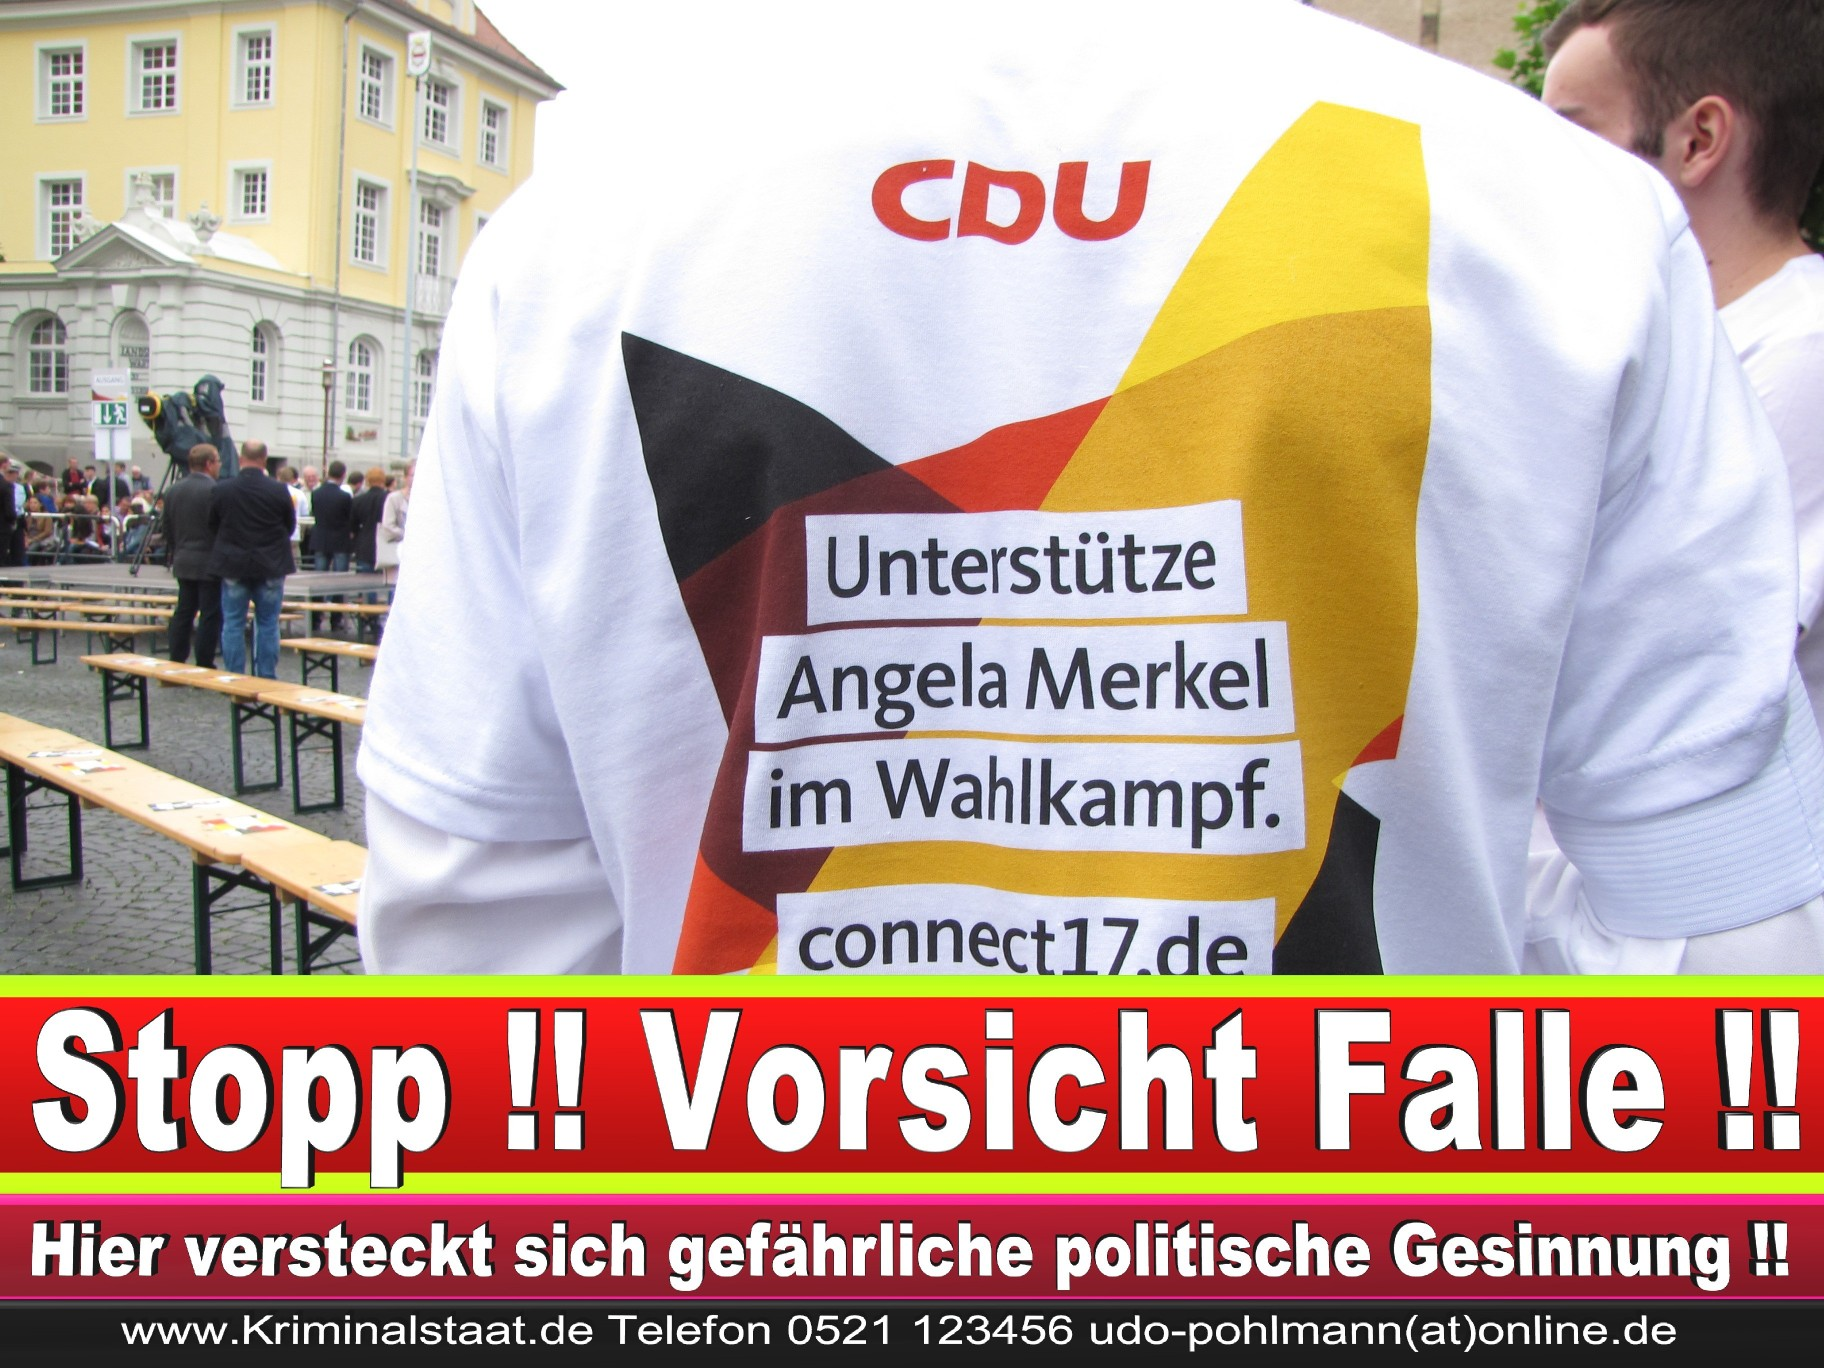 CDU HERFORD Kurruption Betrug Kinderpornografie Kinderpornos 15